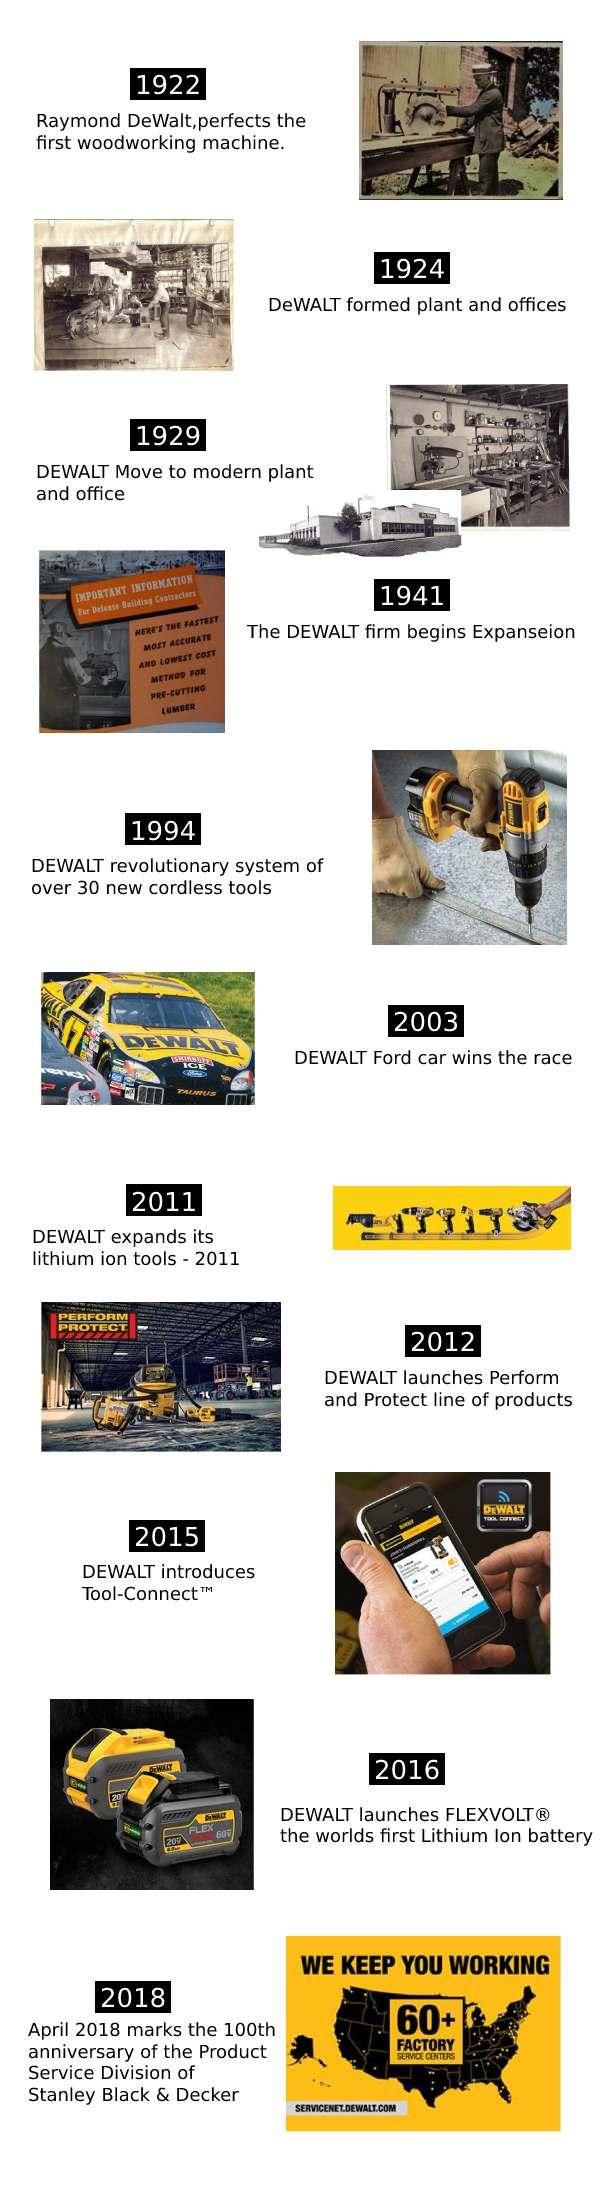 DeWALT History - InfoGraphic